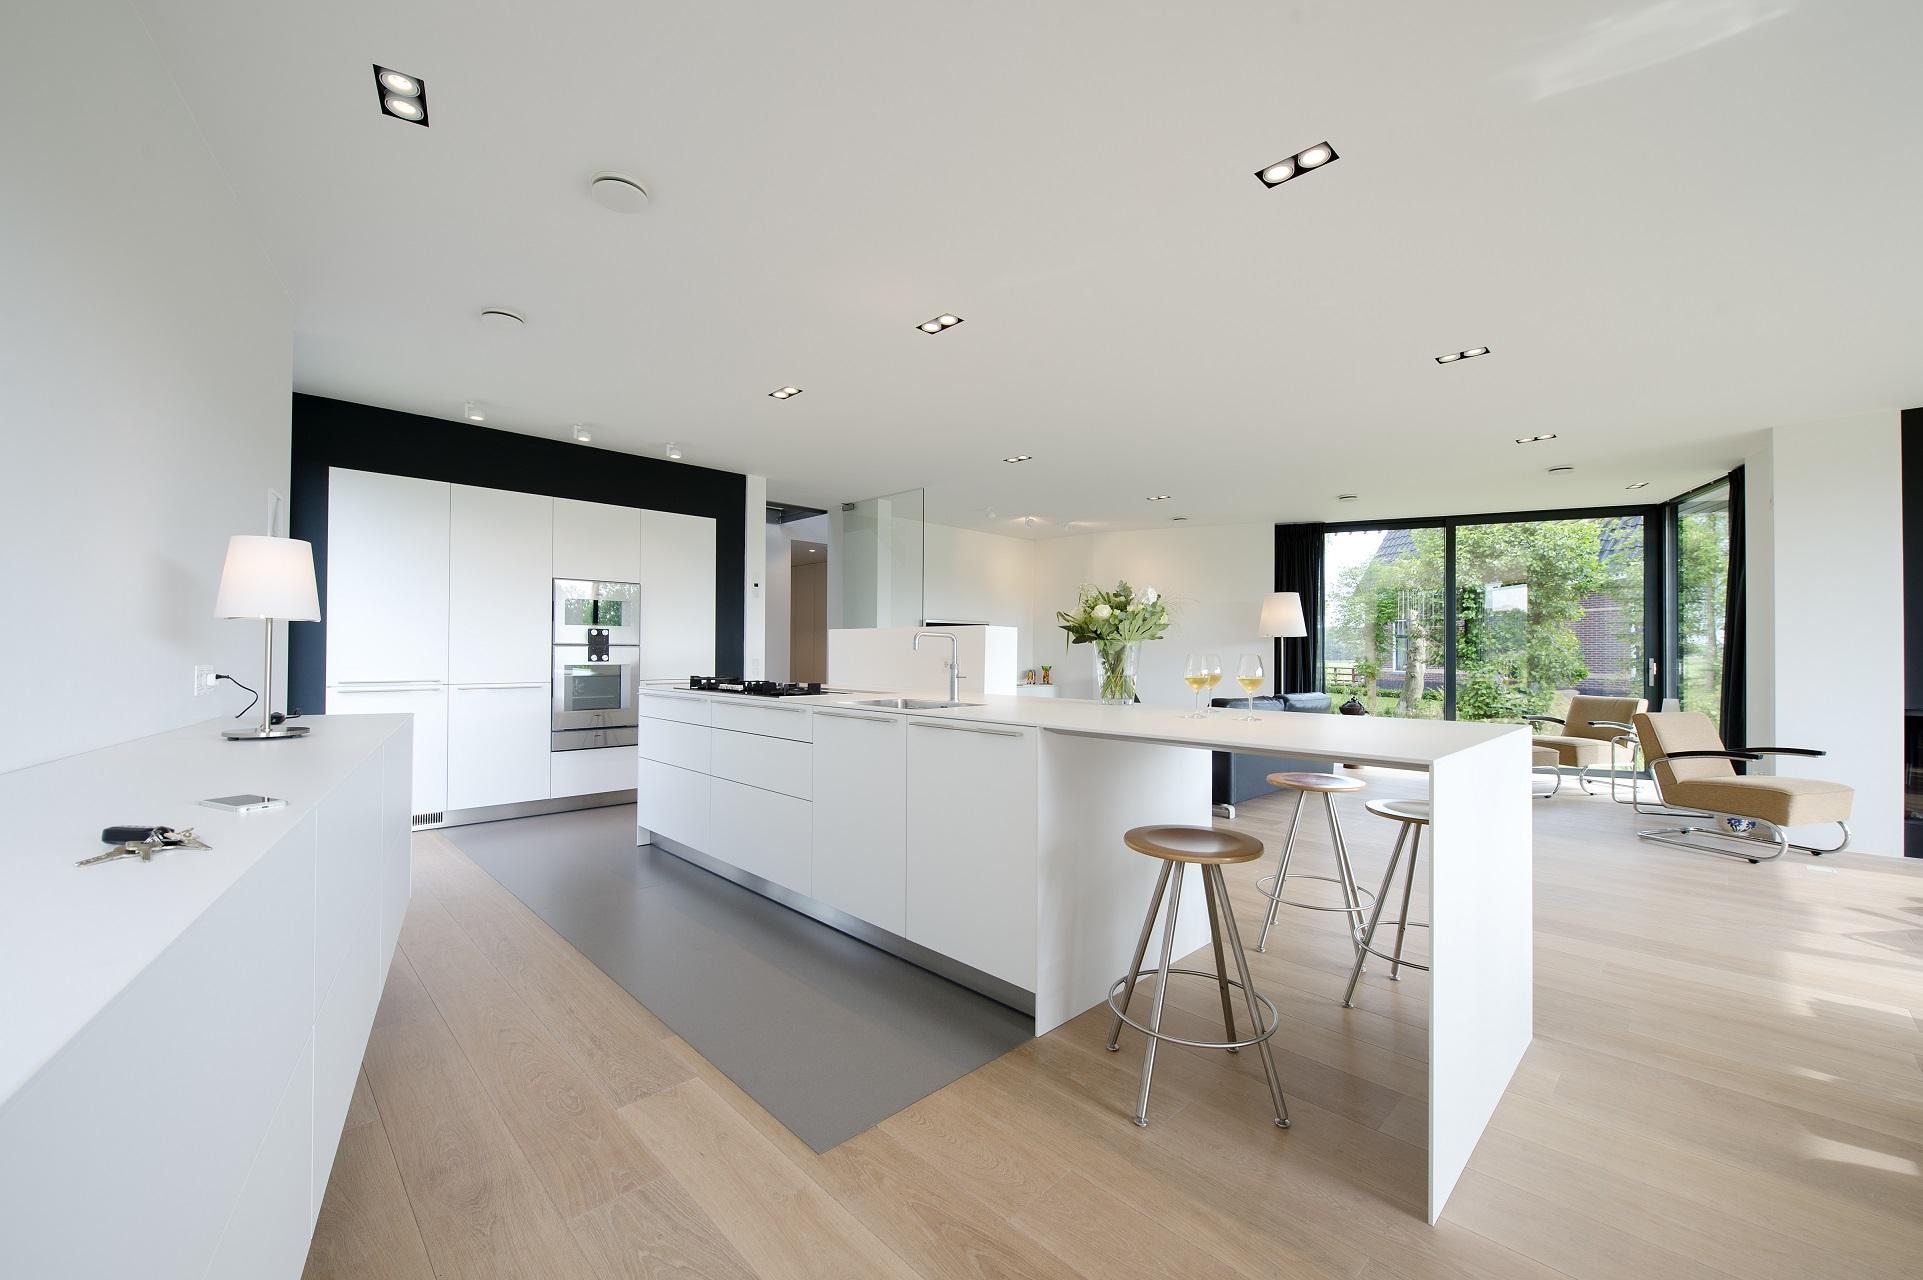 bulthaup keuken in schitterend Haarlems woonhuis - Nieuws Startpagina ...